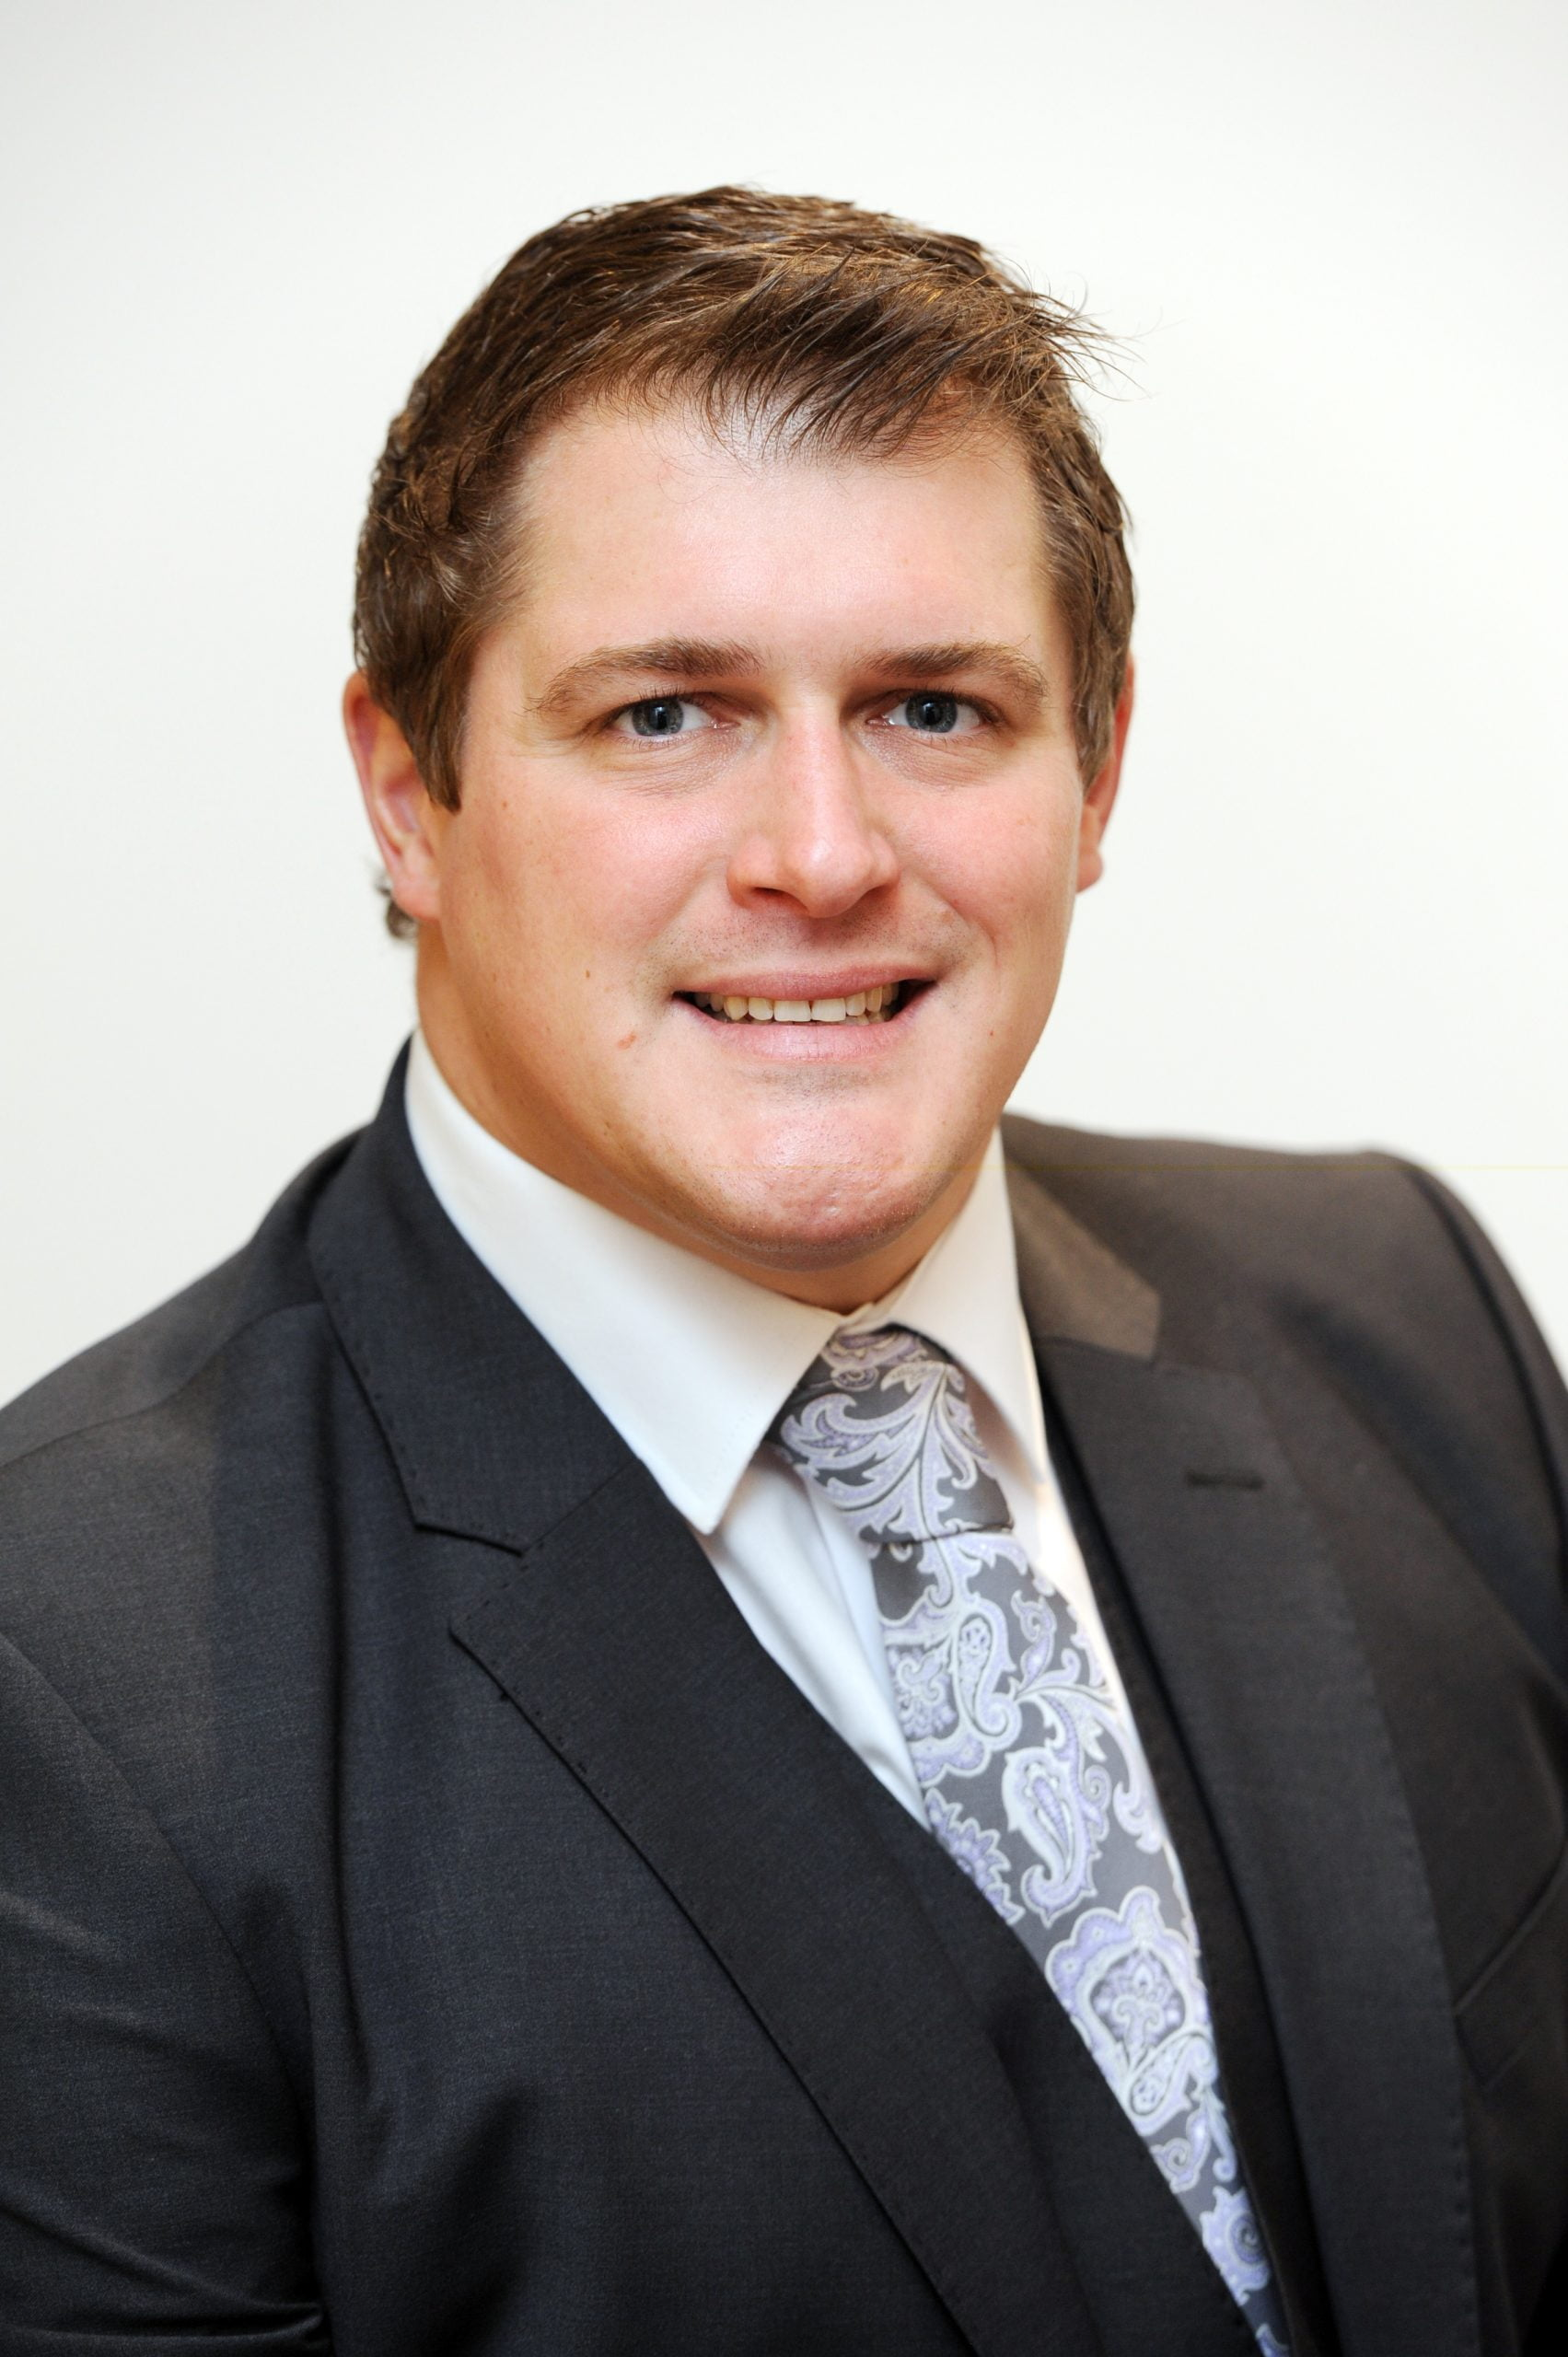 James willcock